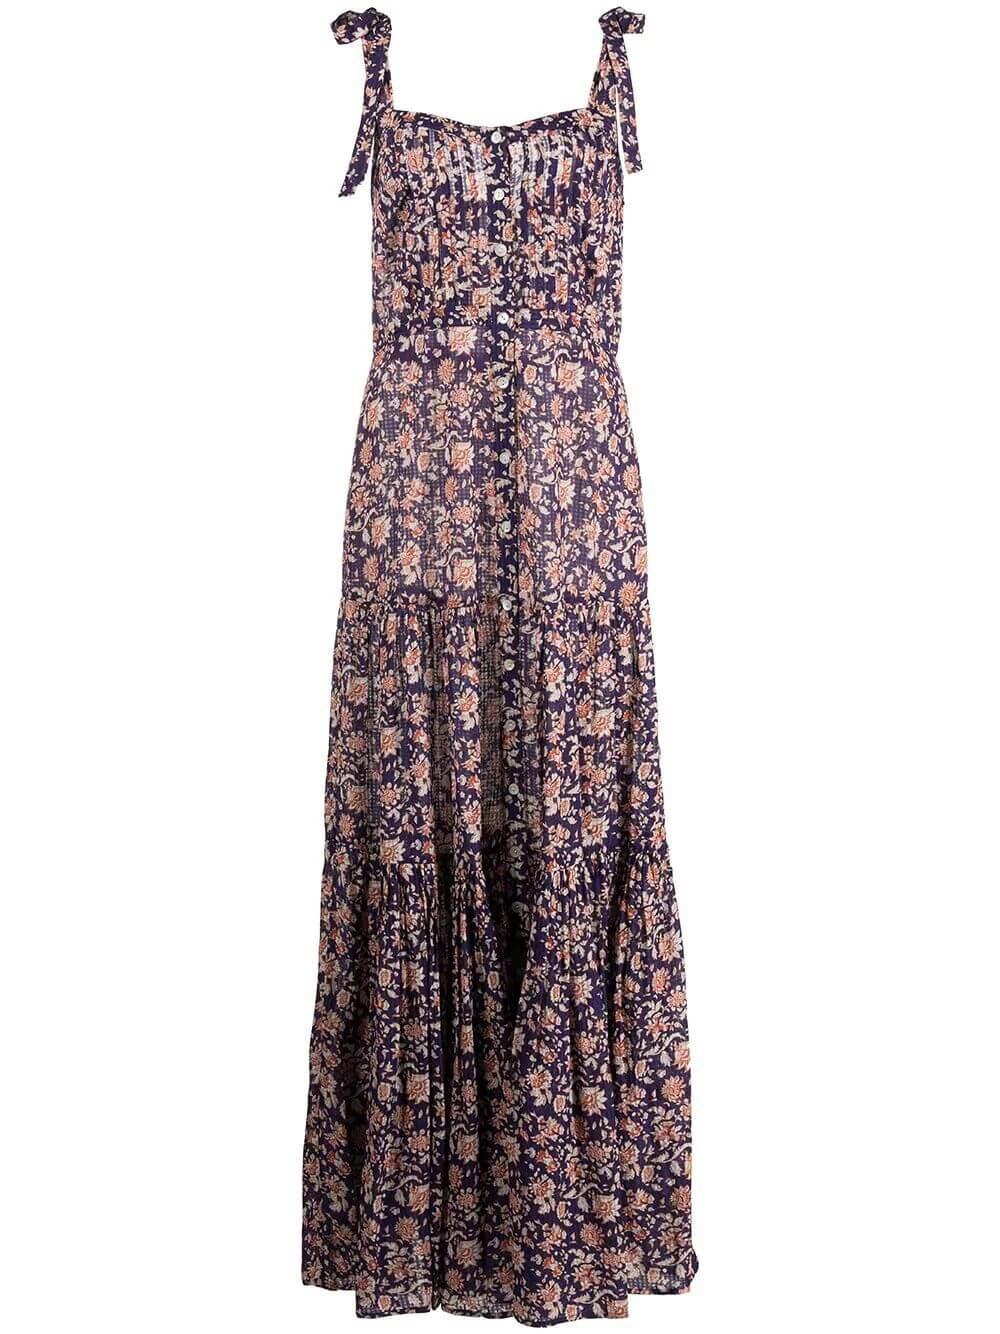 Windansea Dress Item # 2105VO0172753